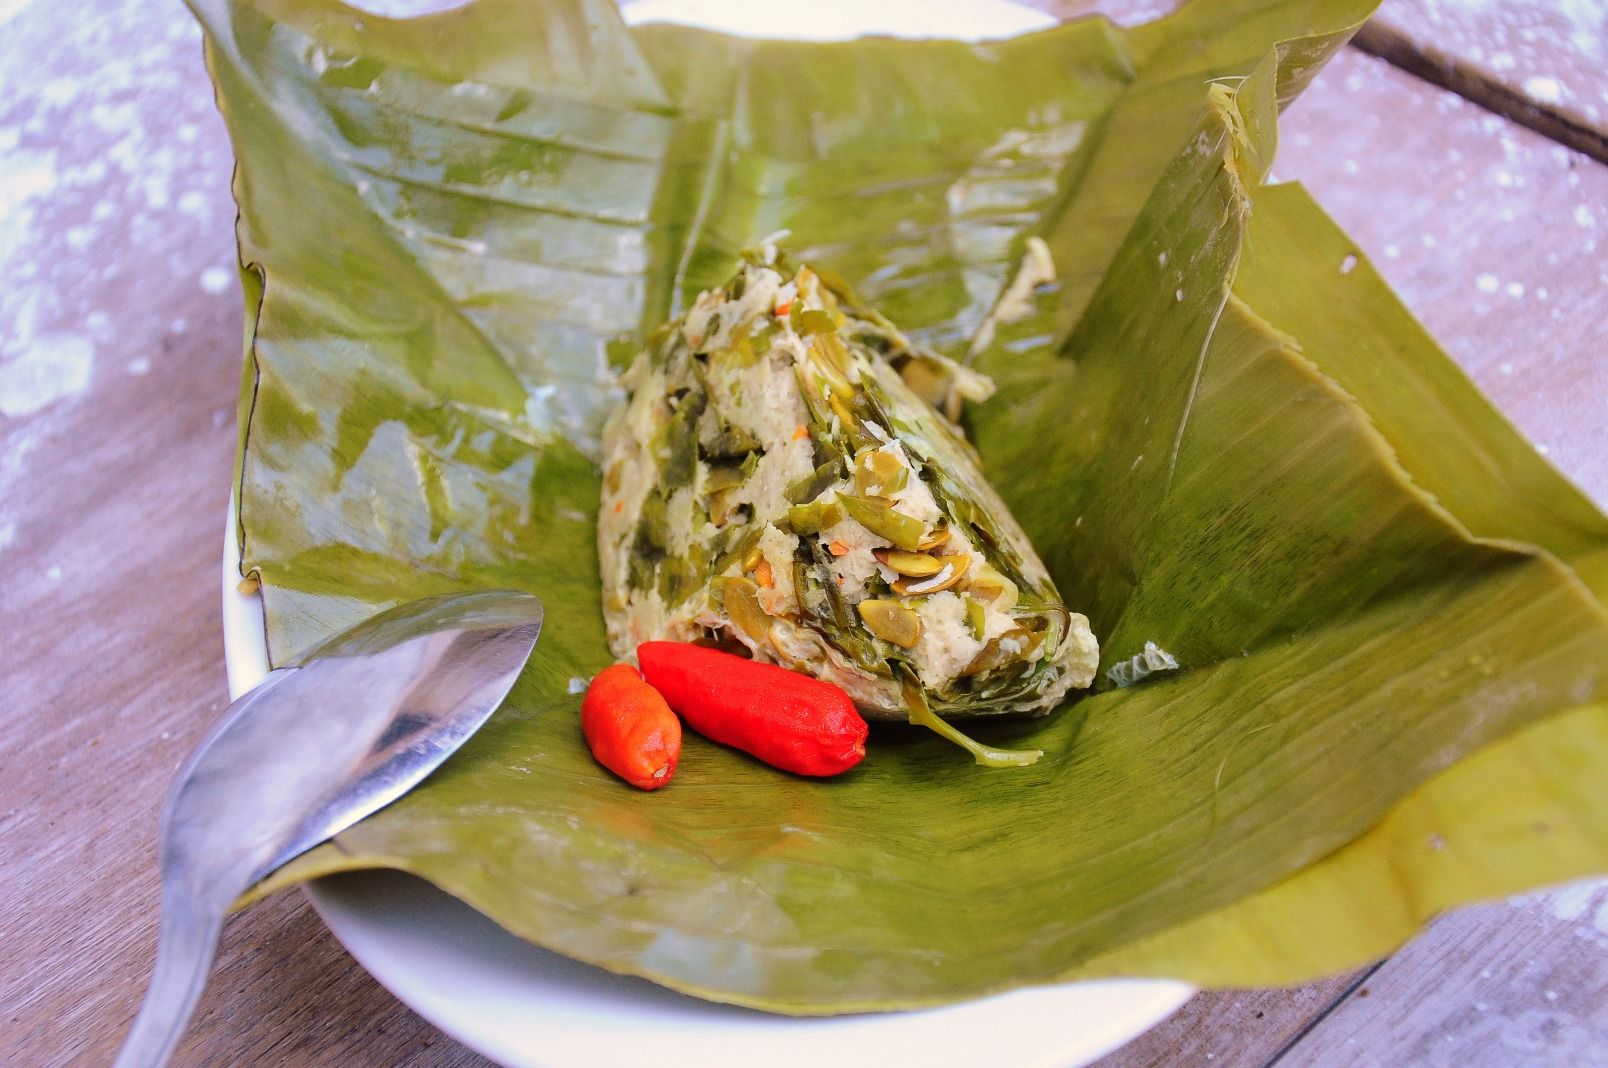 Masakan Khas Kota Solo Bothok Wungkus Bothok Teri Bothok Mlanding Resep Masakan Masakan Makanan Dan Minuman